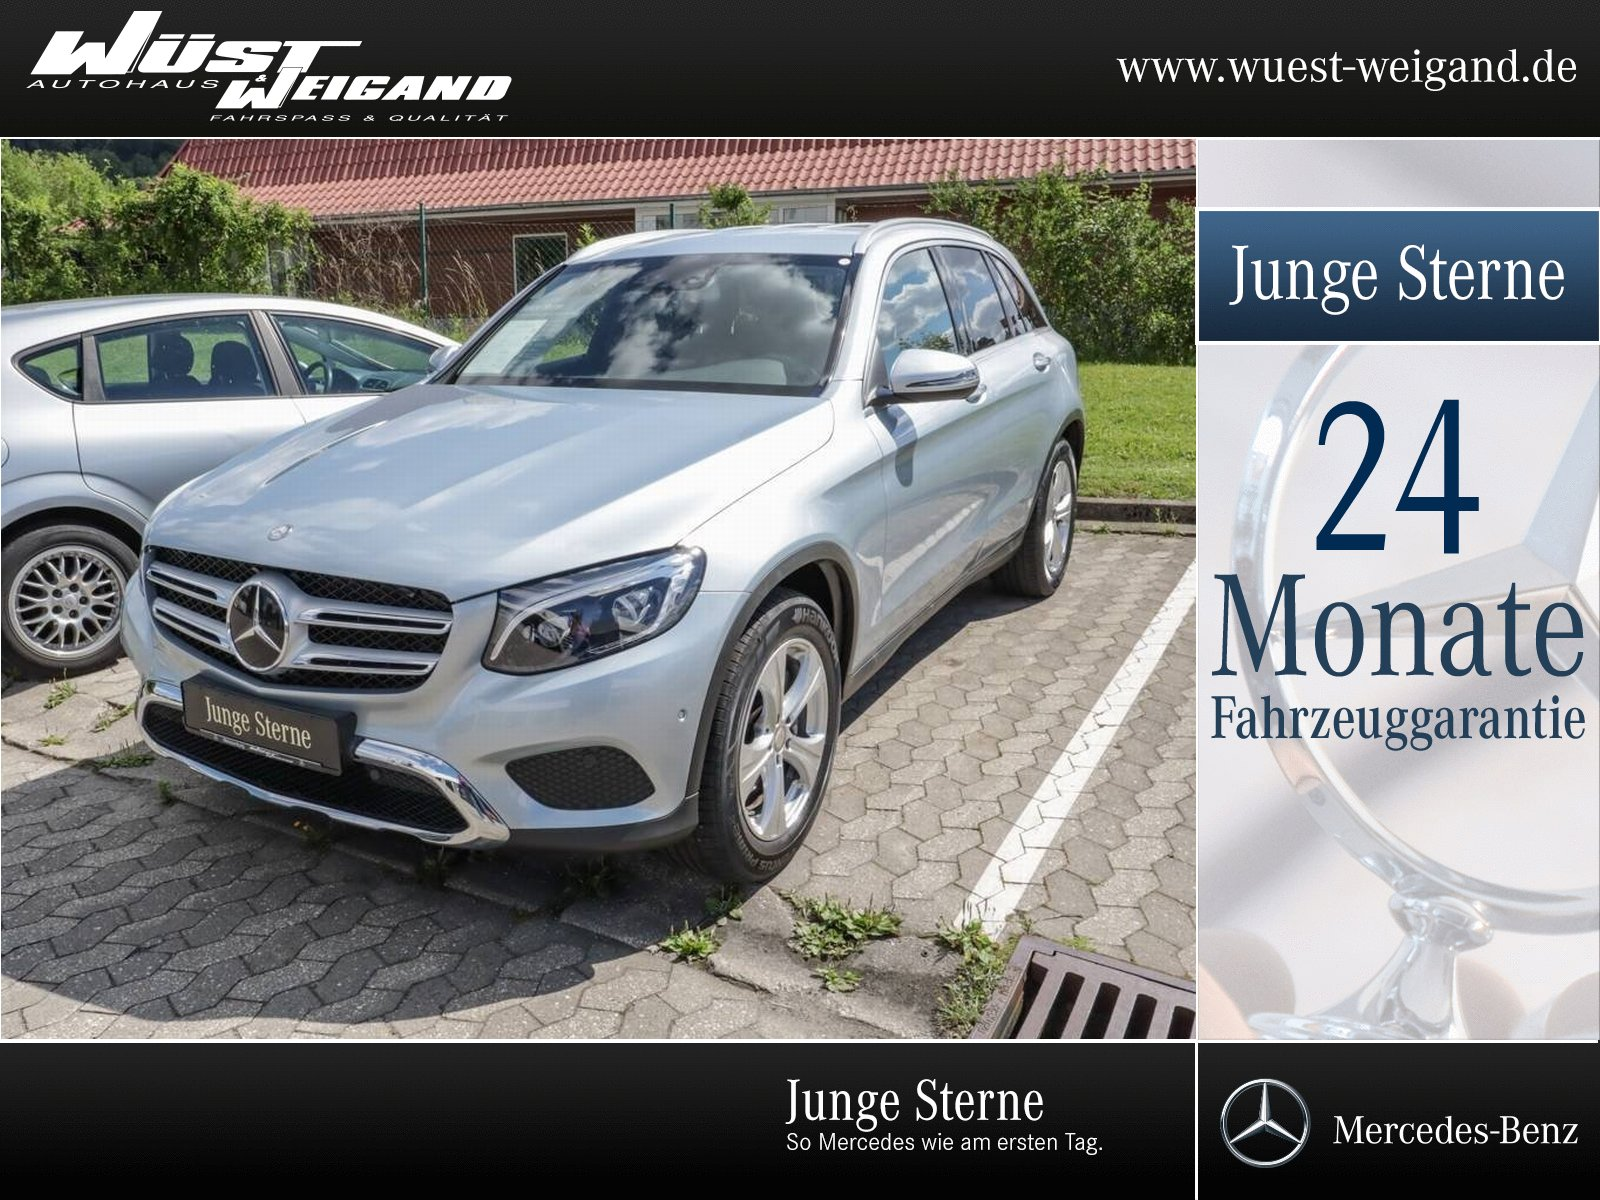 Mercedes-Benz GLC 250 d 4Ma. Excl.+AMG-Line+Comand+Kamera+AHK, Jahr 2015, Diesel